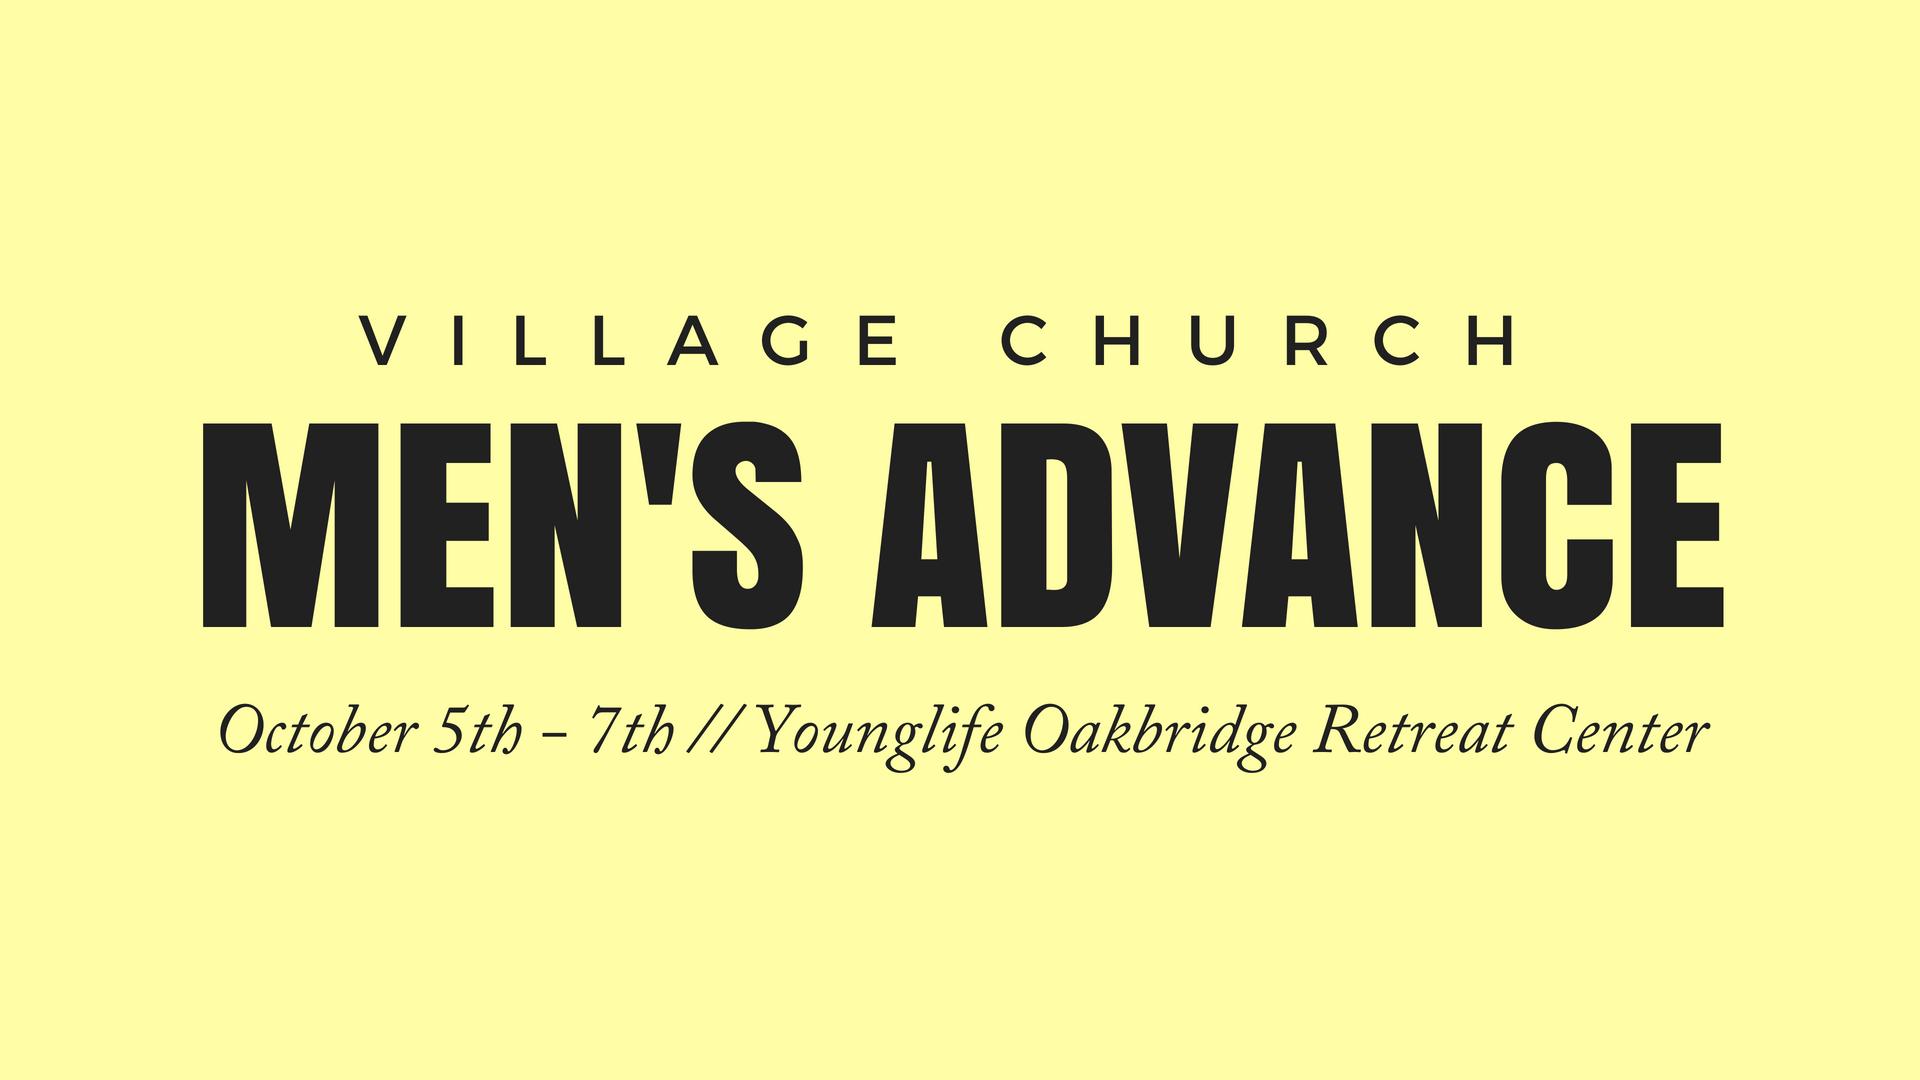 Men s advance 2017